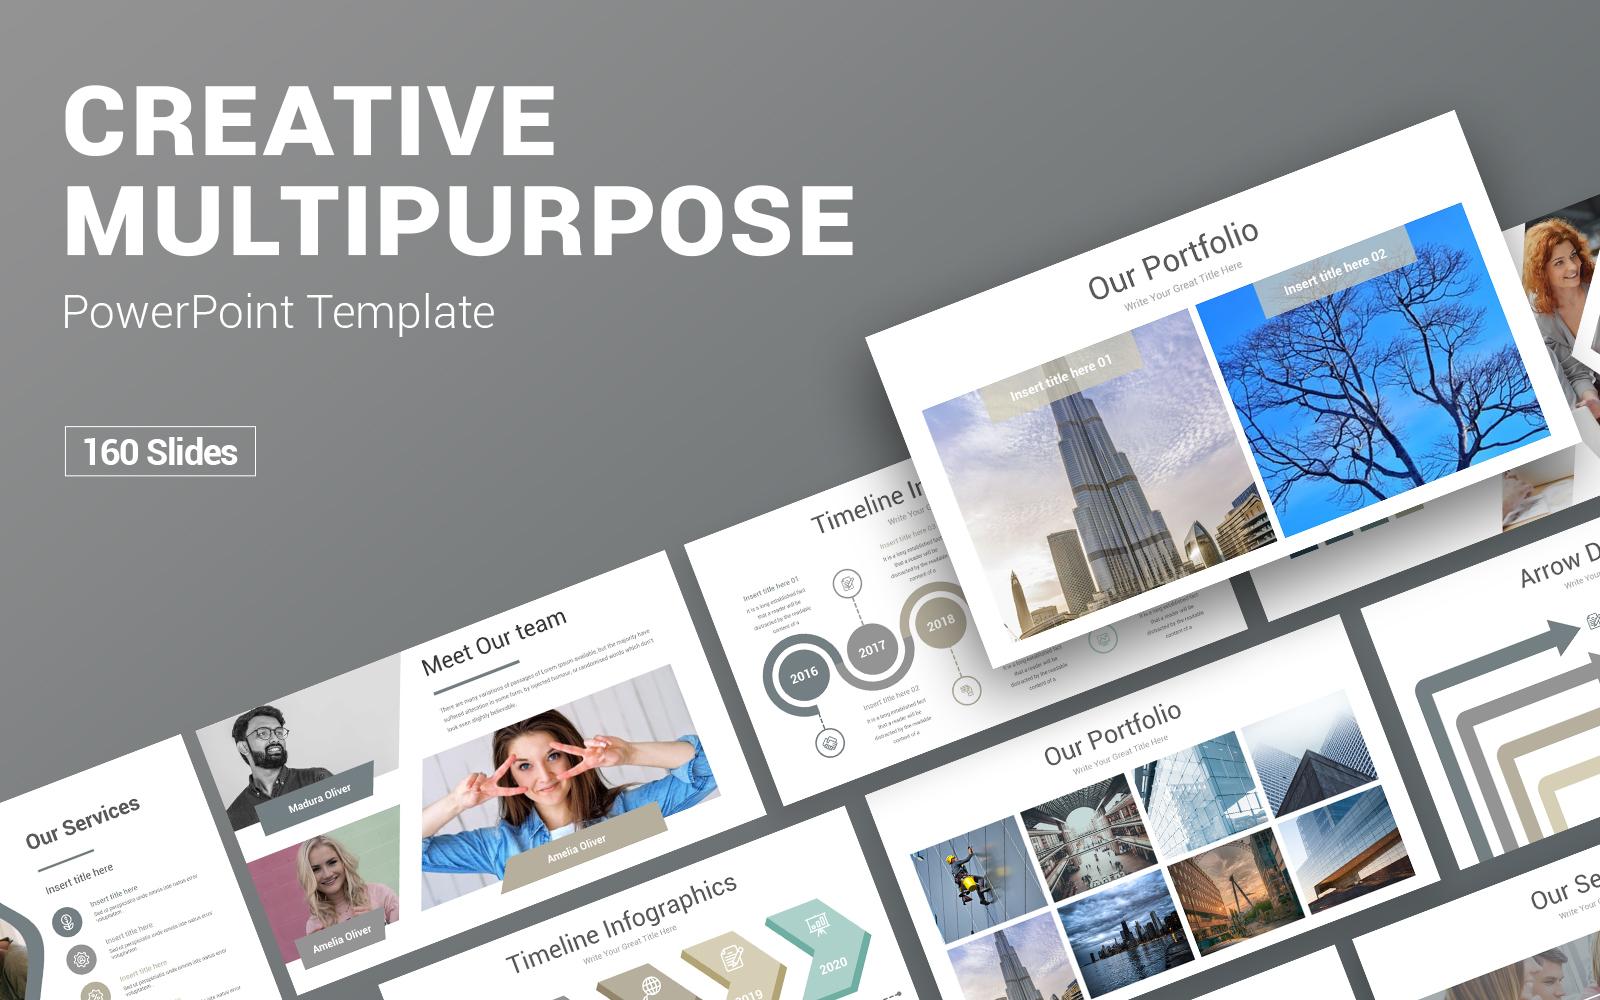 Creative Multipurpose PowerPoint Template